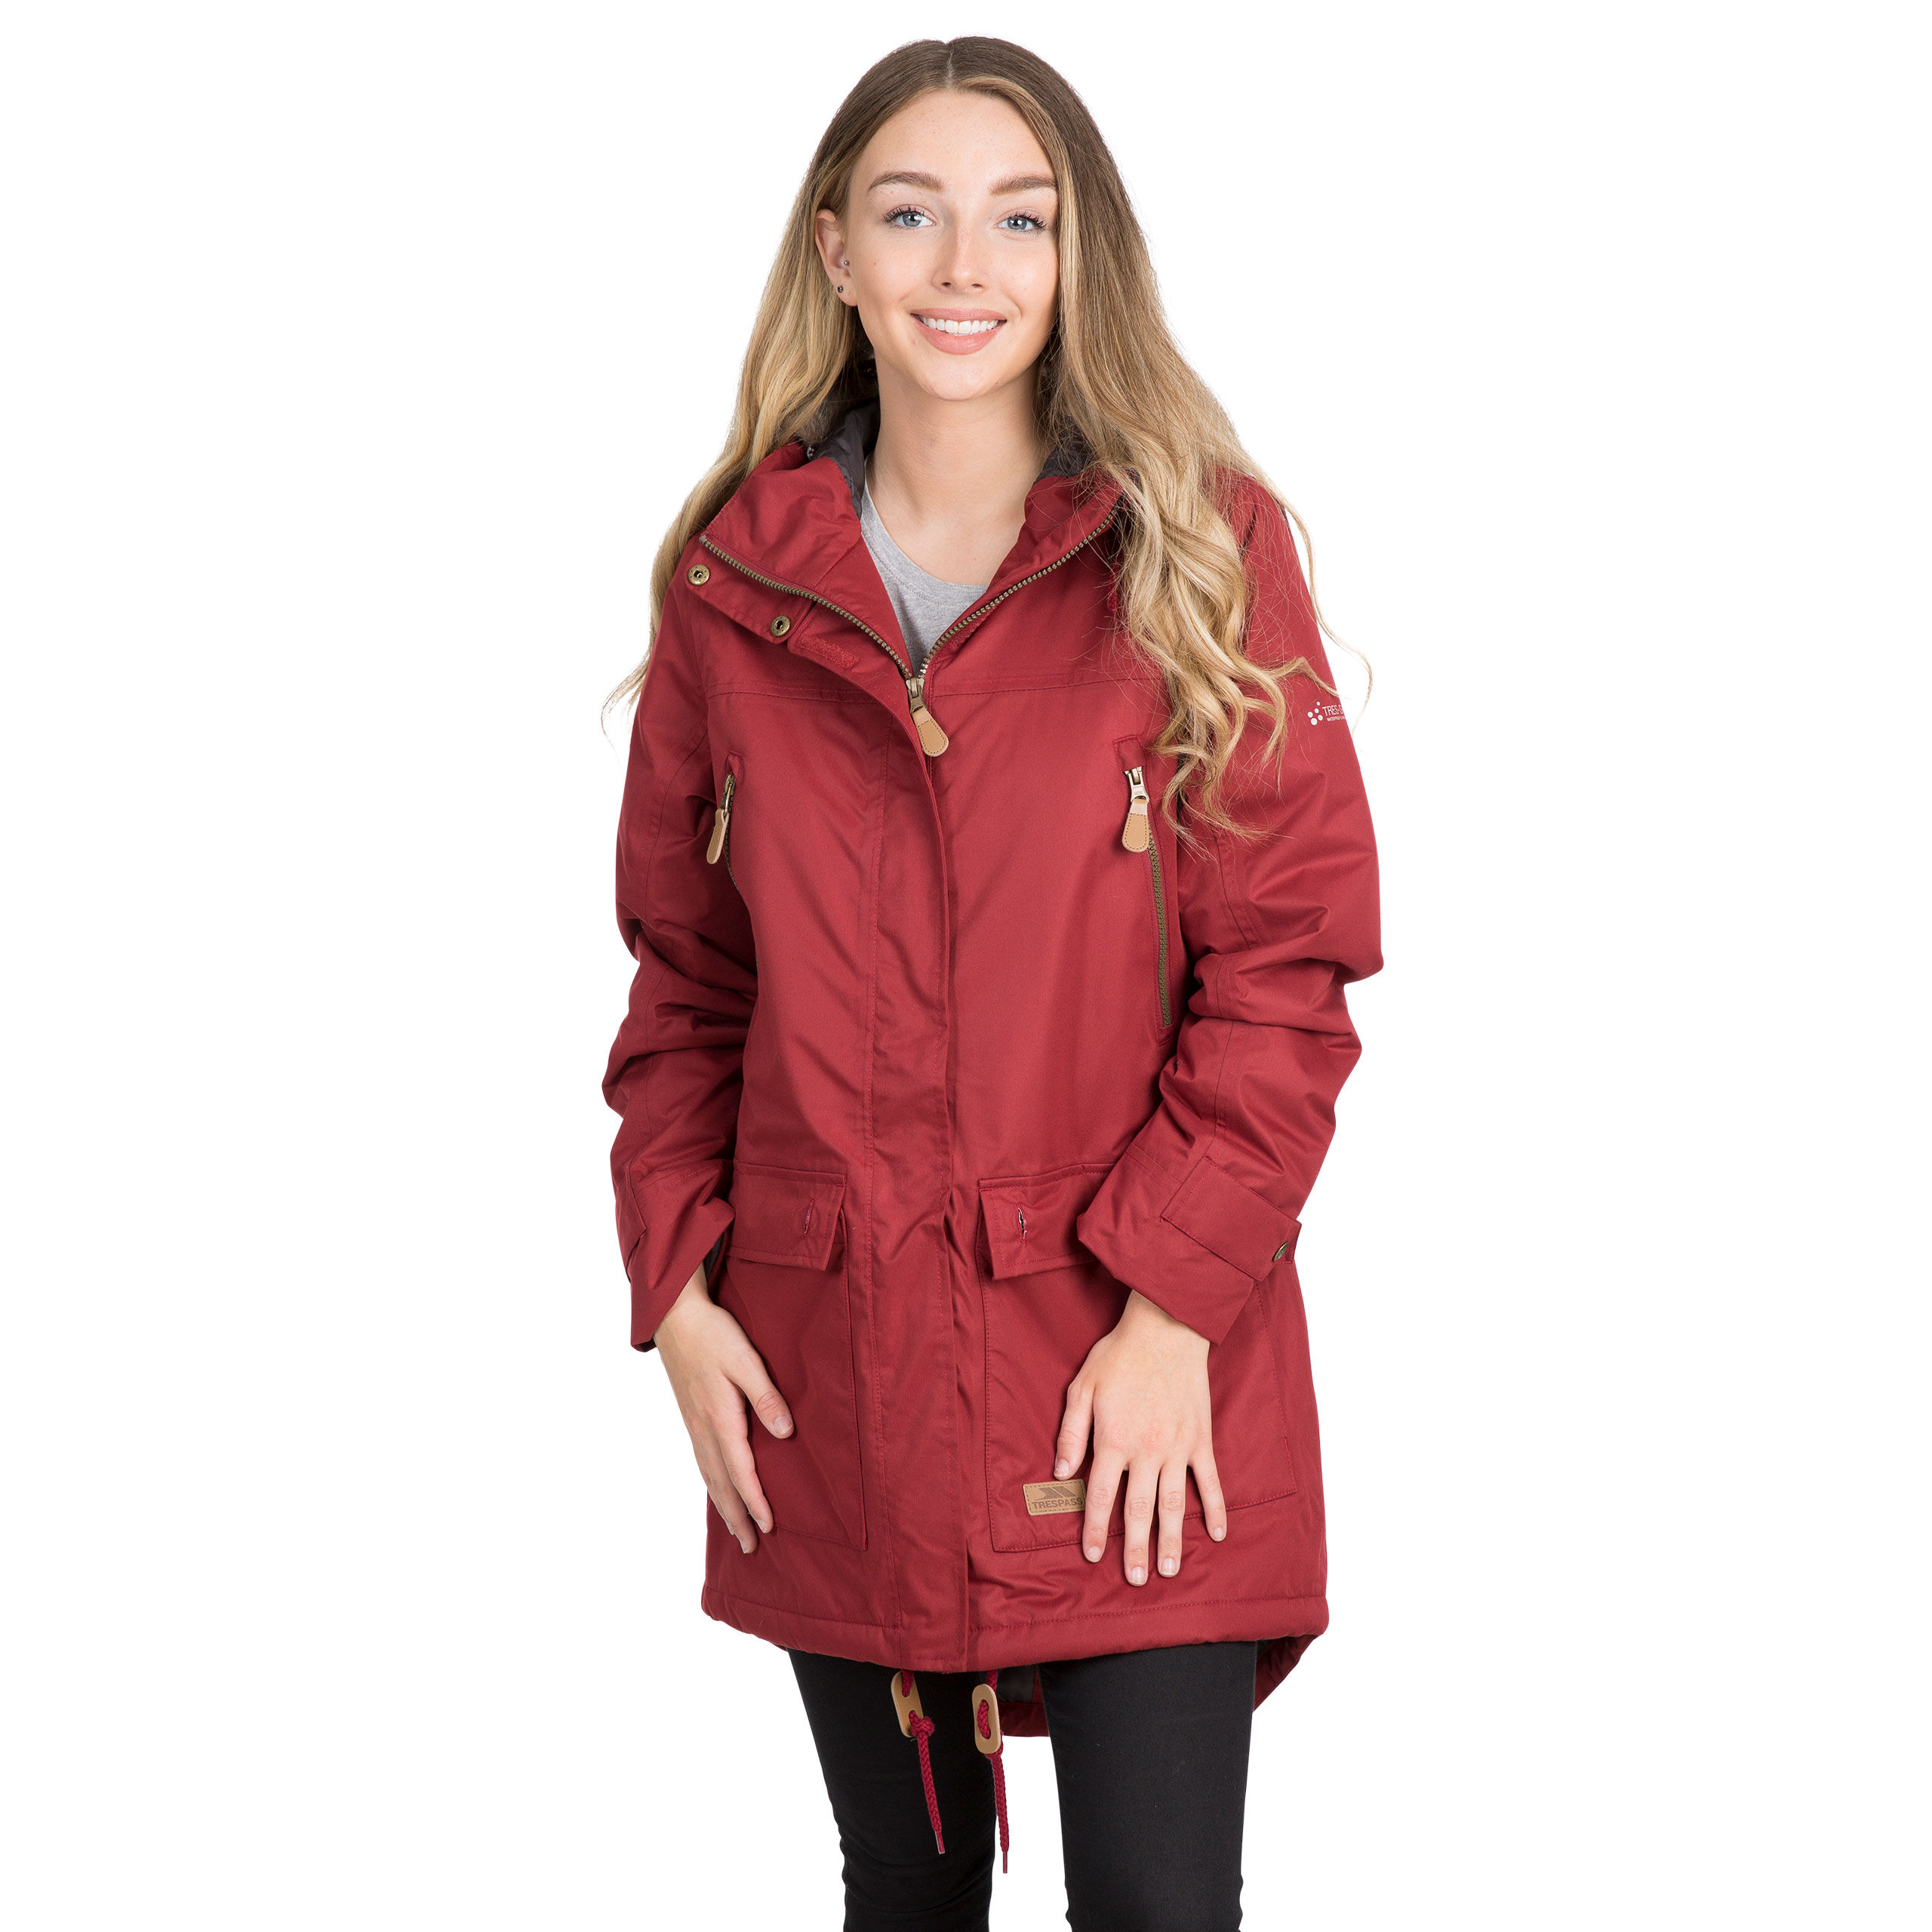 Trespass-Clea-Womens-Waterproof-Jacket-Ladies-Long-Rain-Coat-with-Hood thumbnail 19